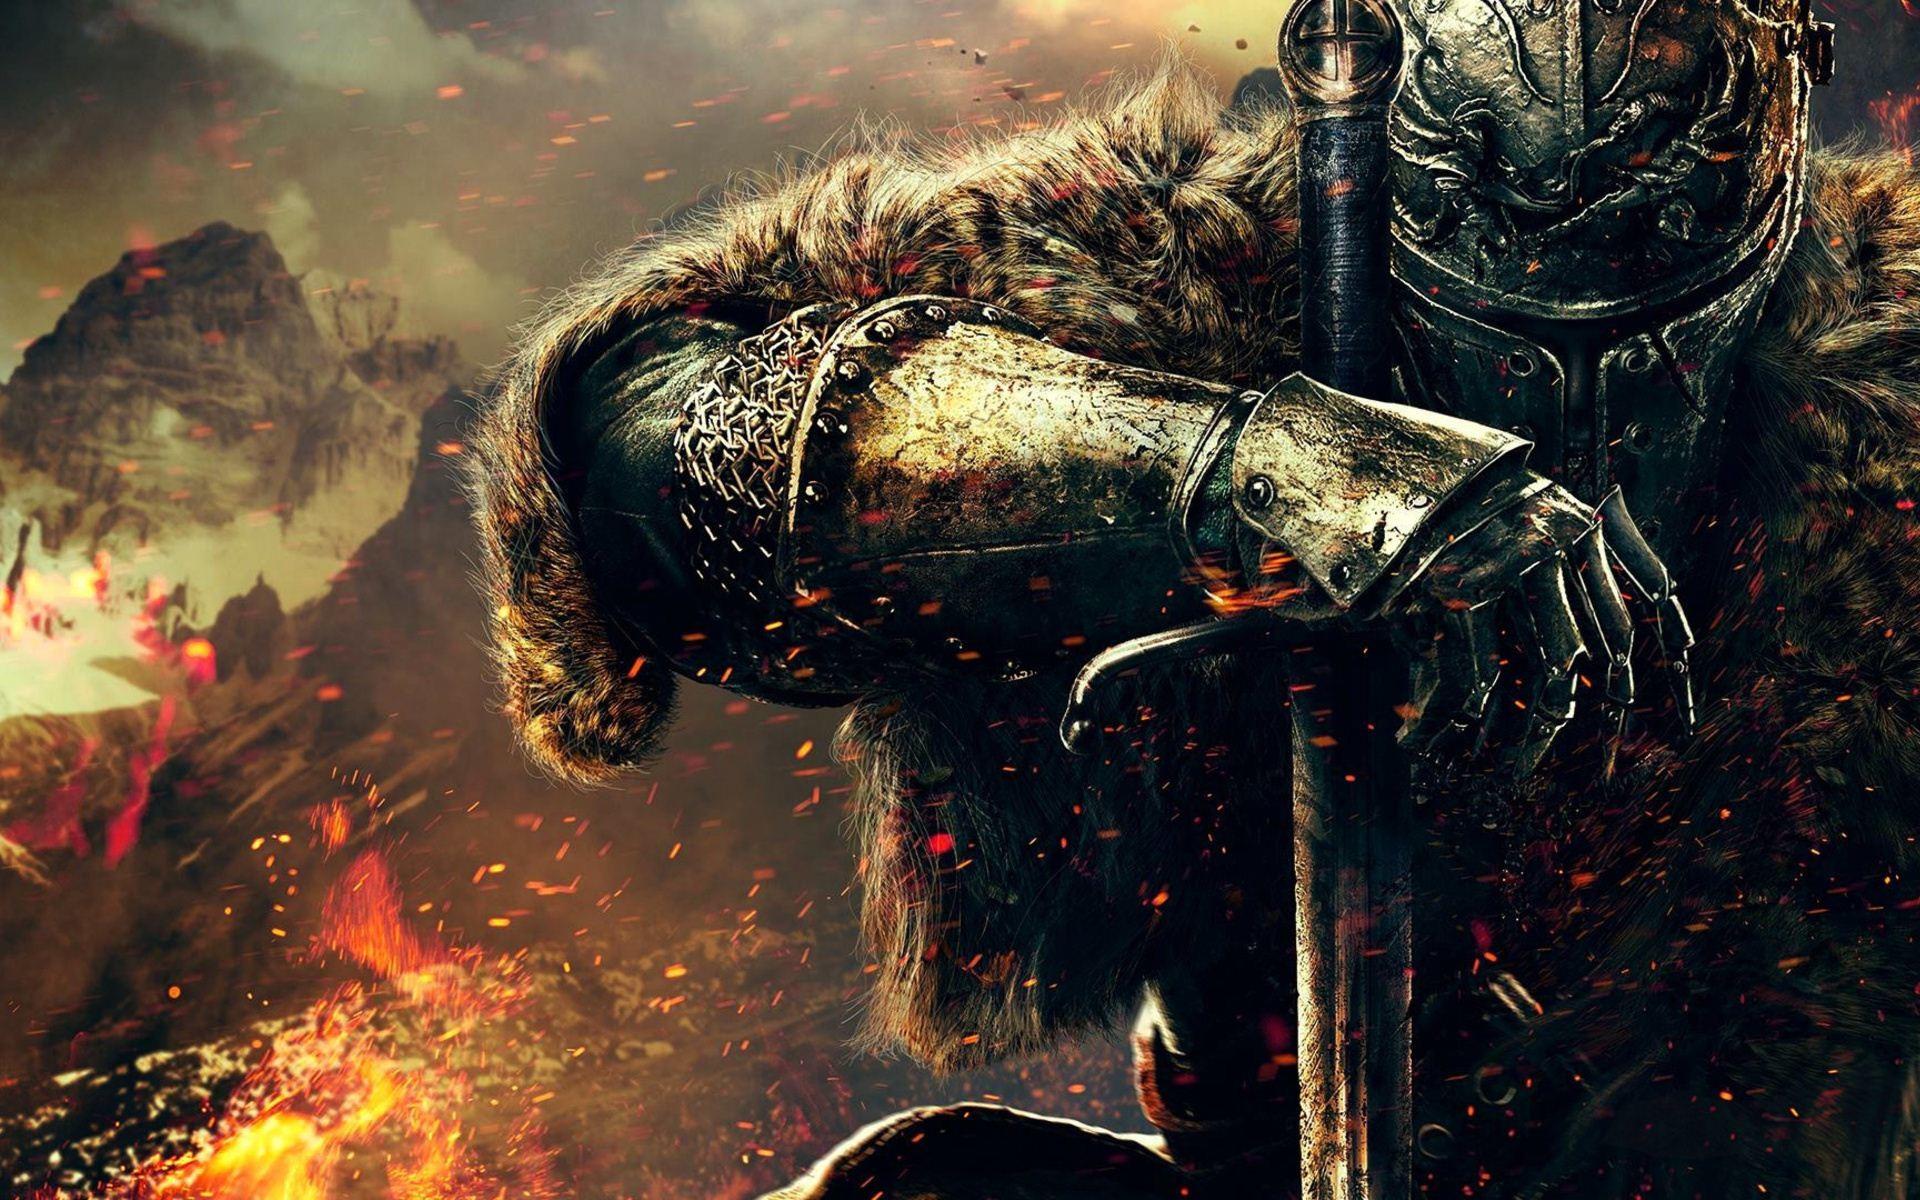 Dark souls 3,Games,Gaming,Wallpaper,hot game https://